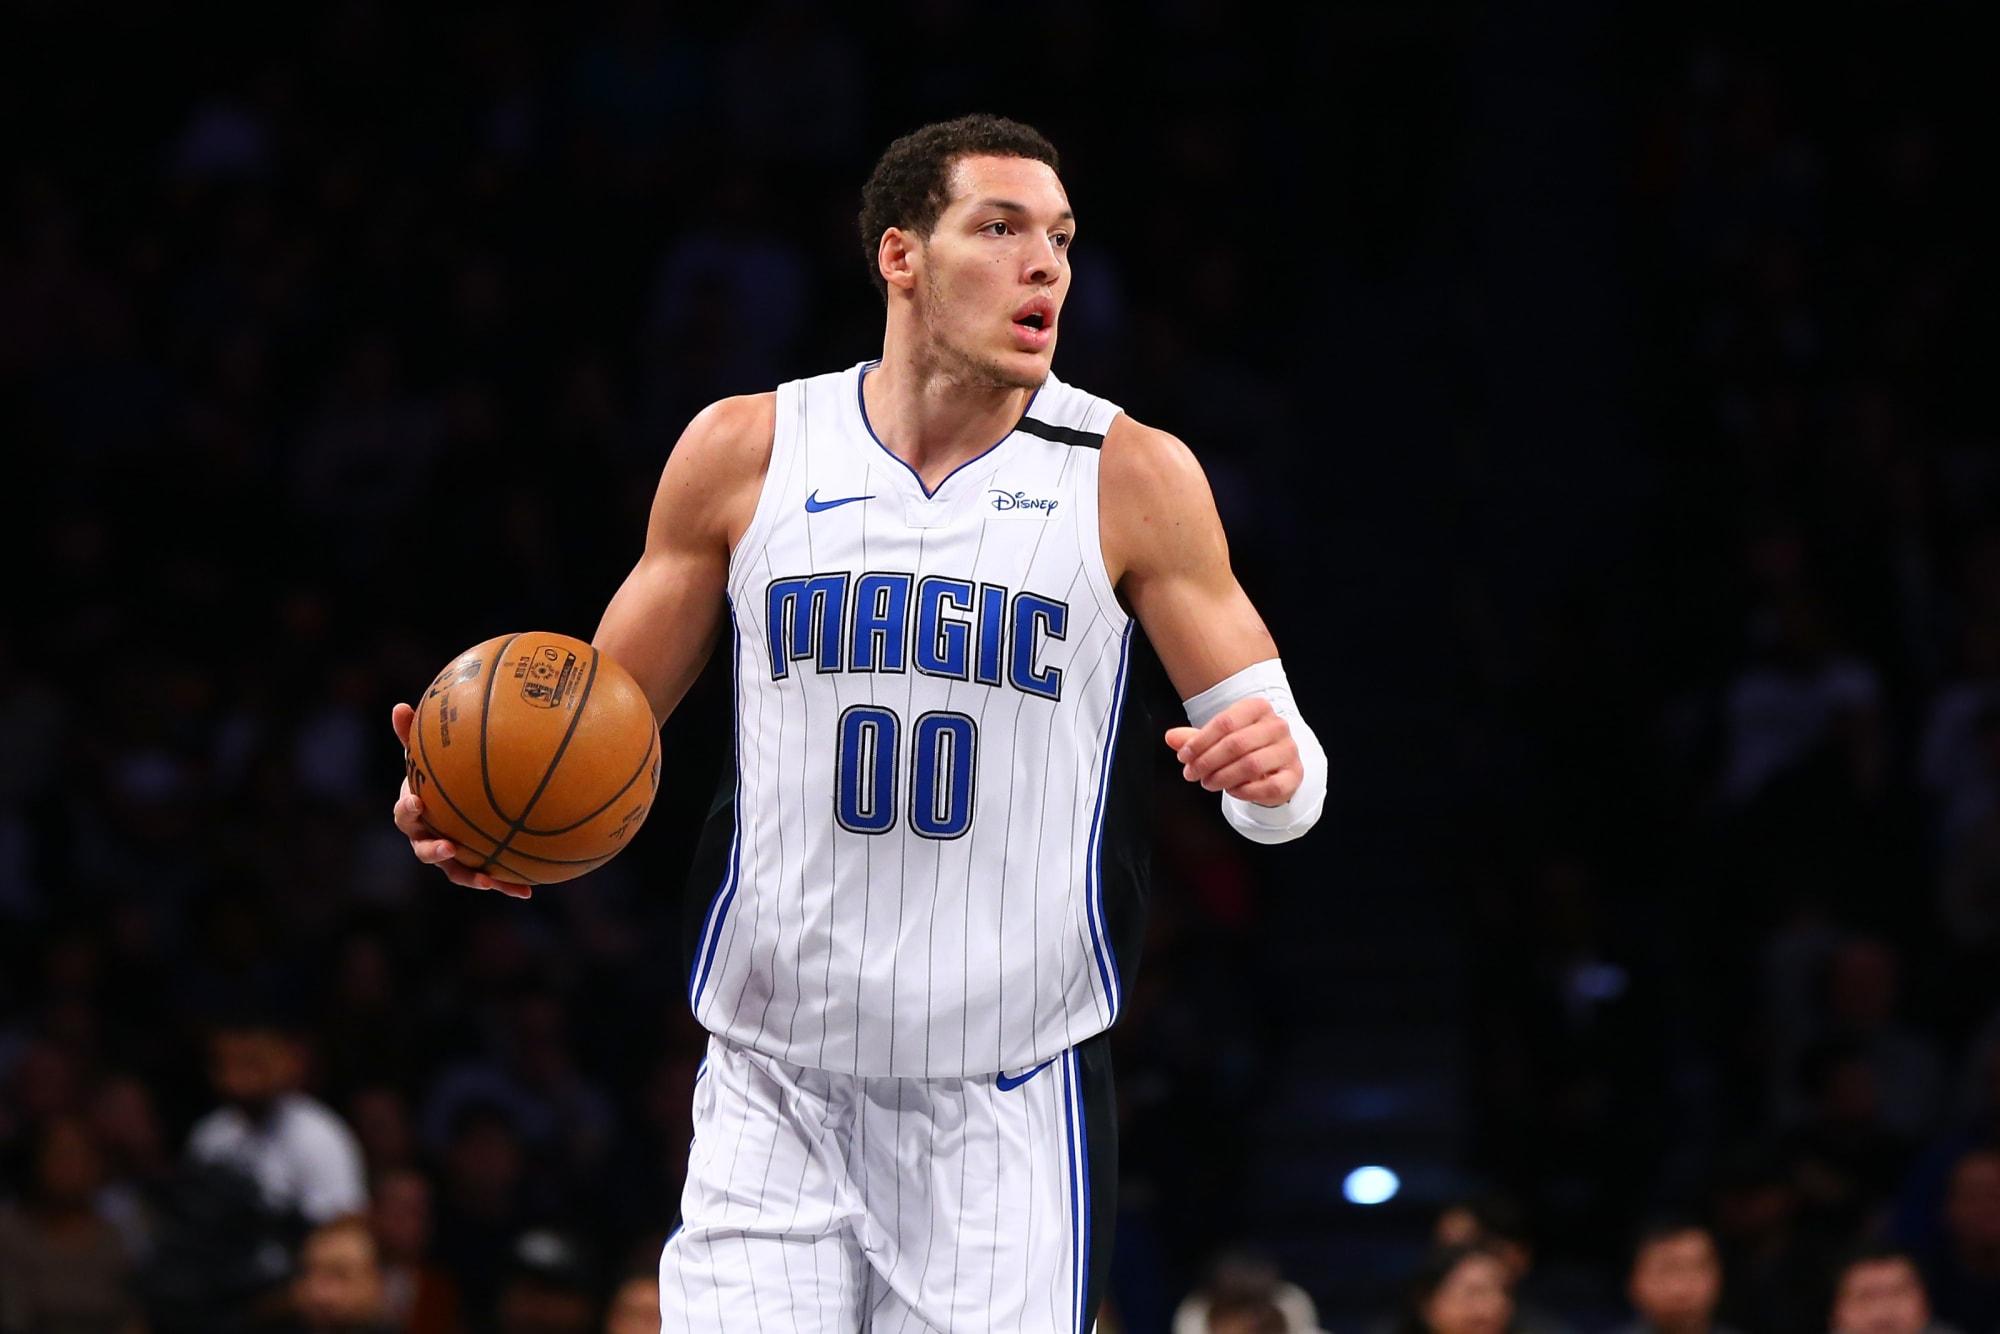 Warriors: Do the Aaron Gordon trade rumors make sense?